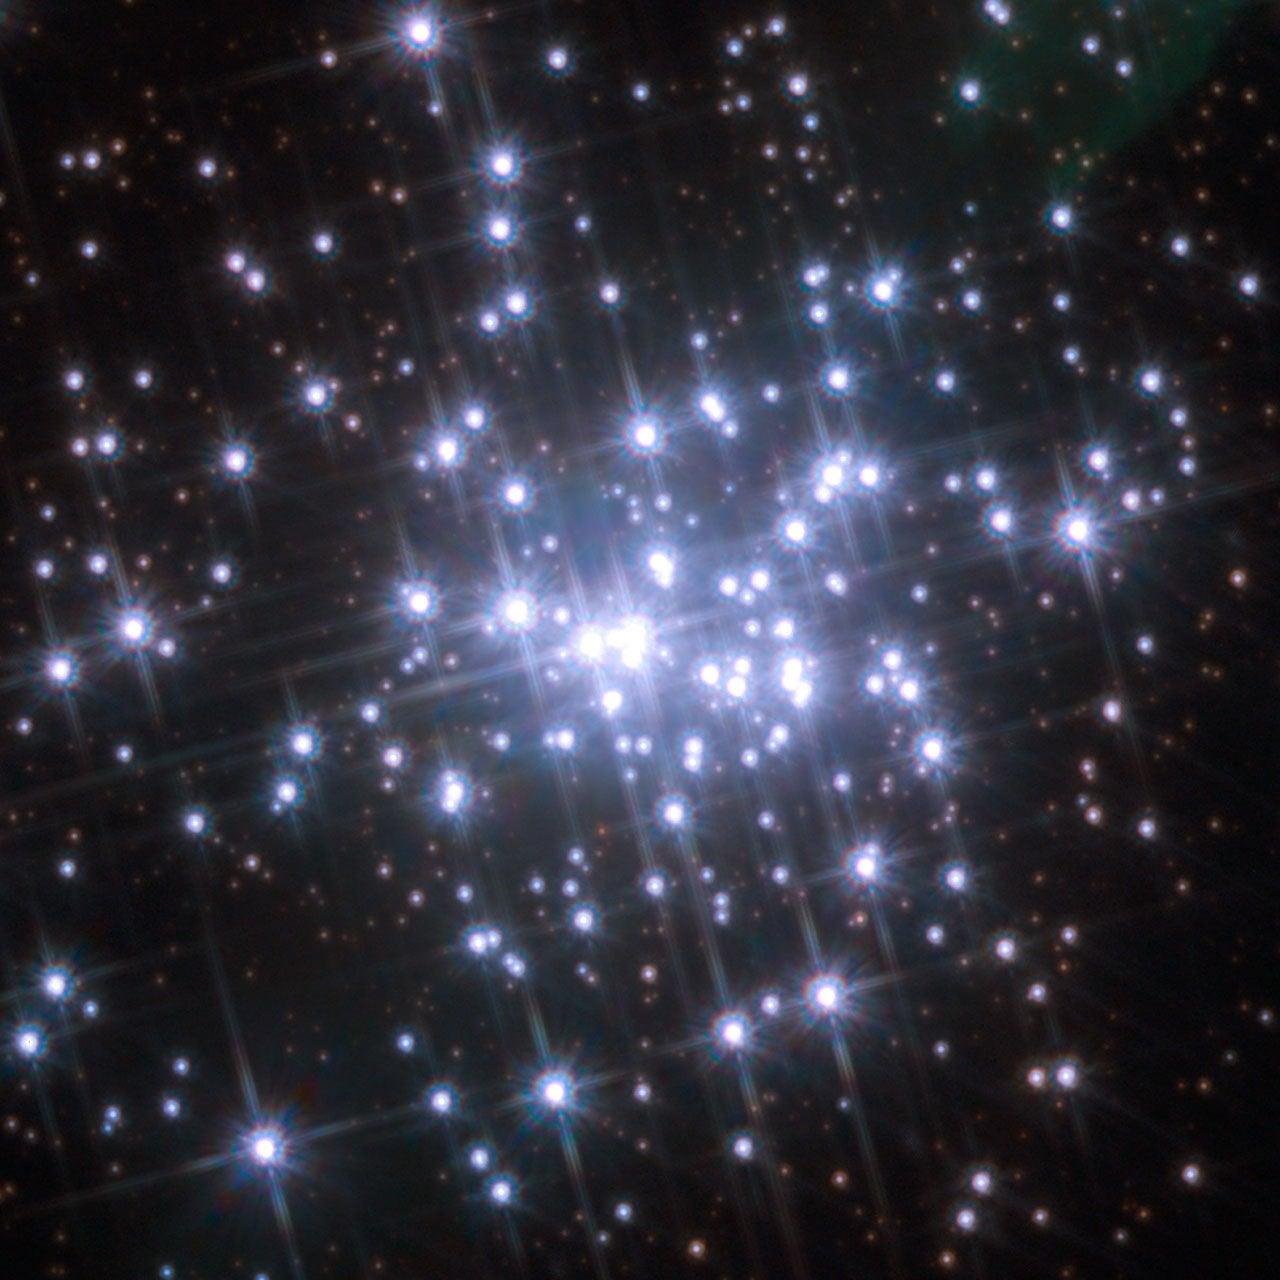 Hubble Glimpses Stars on the Move